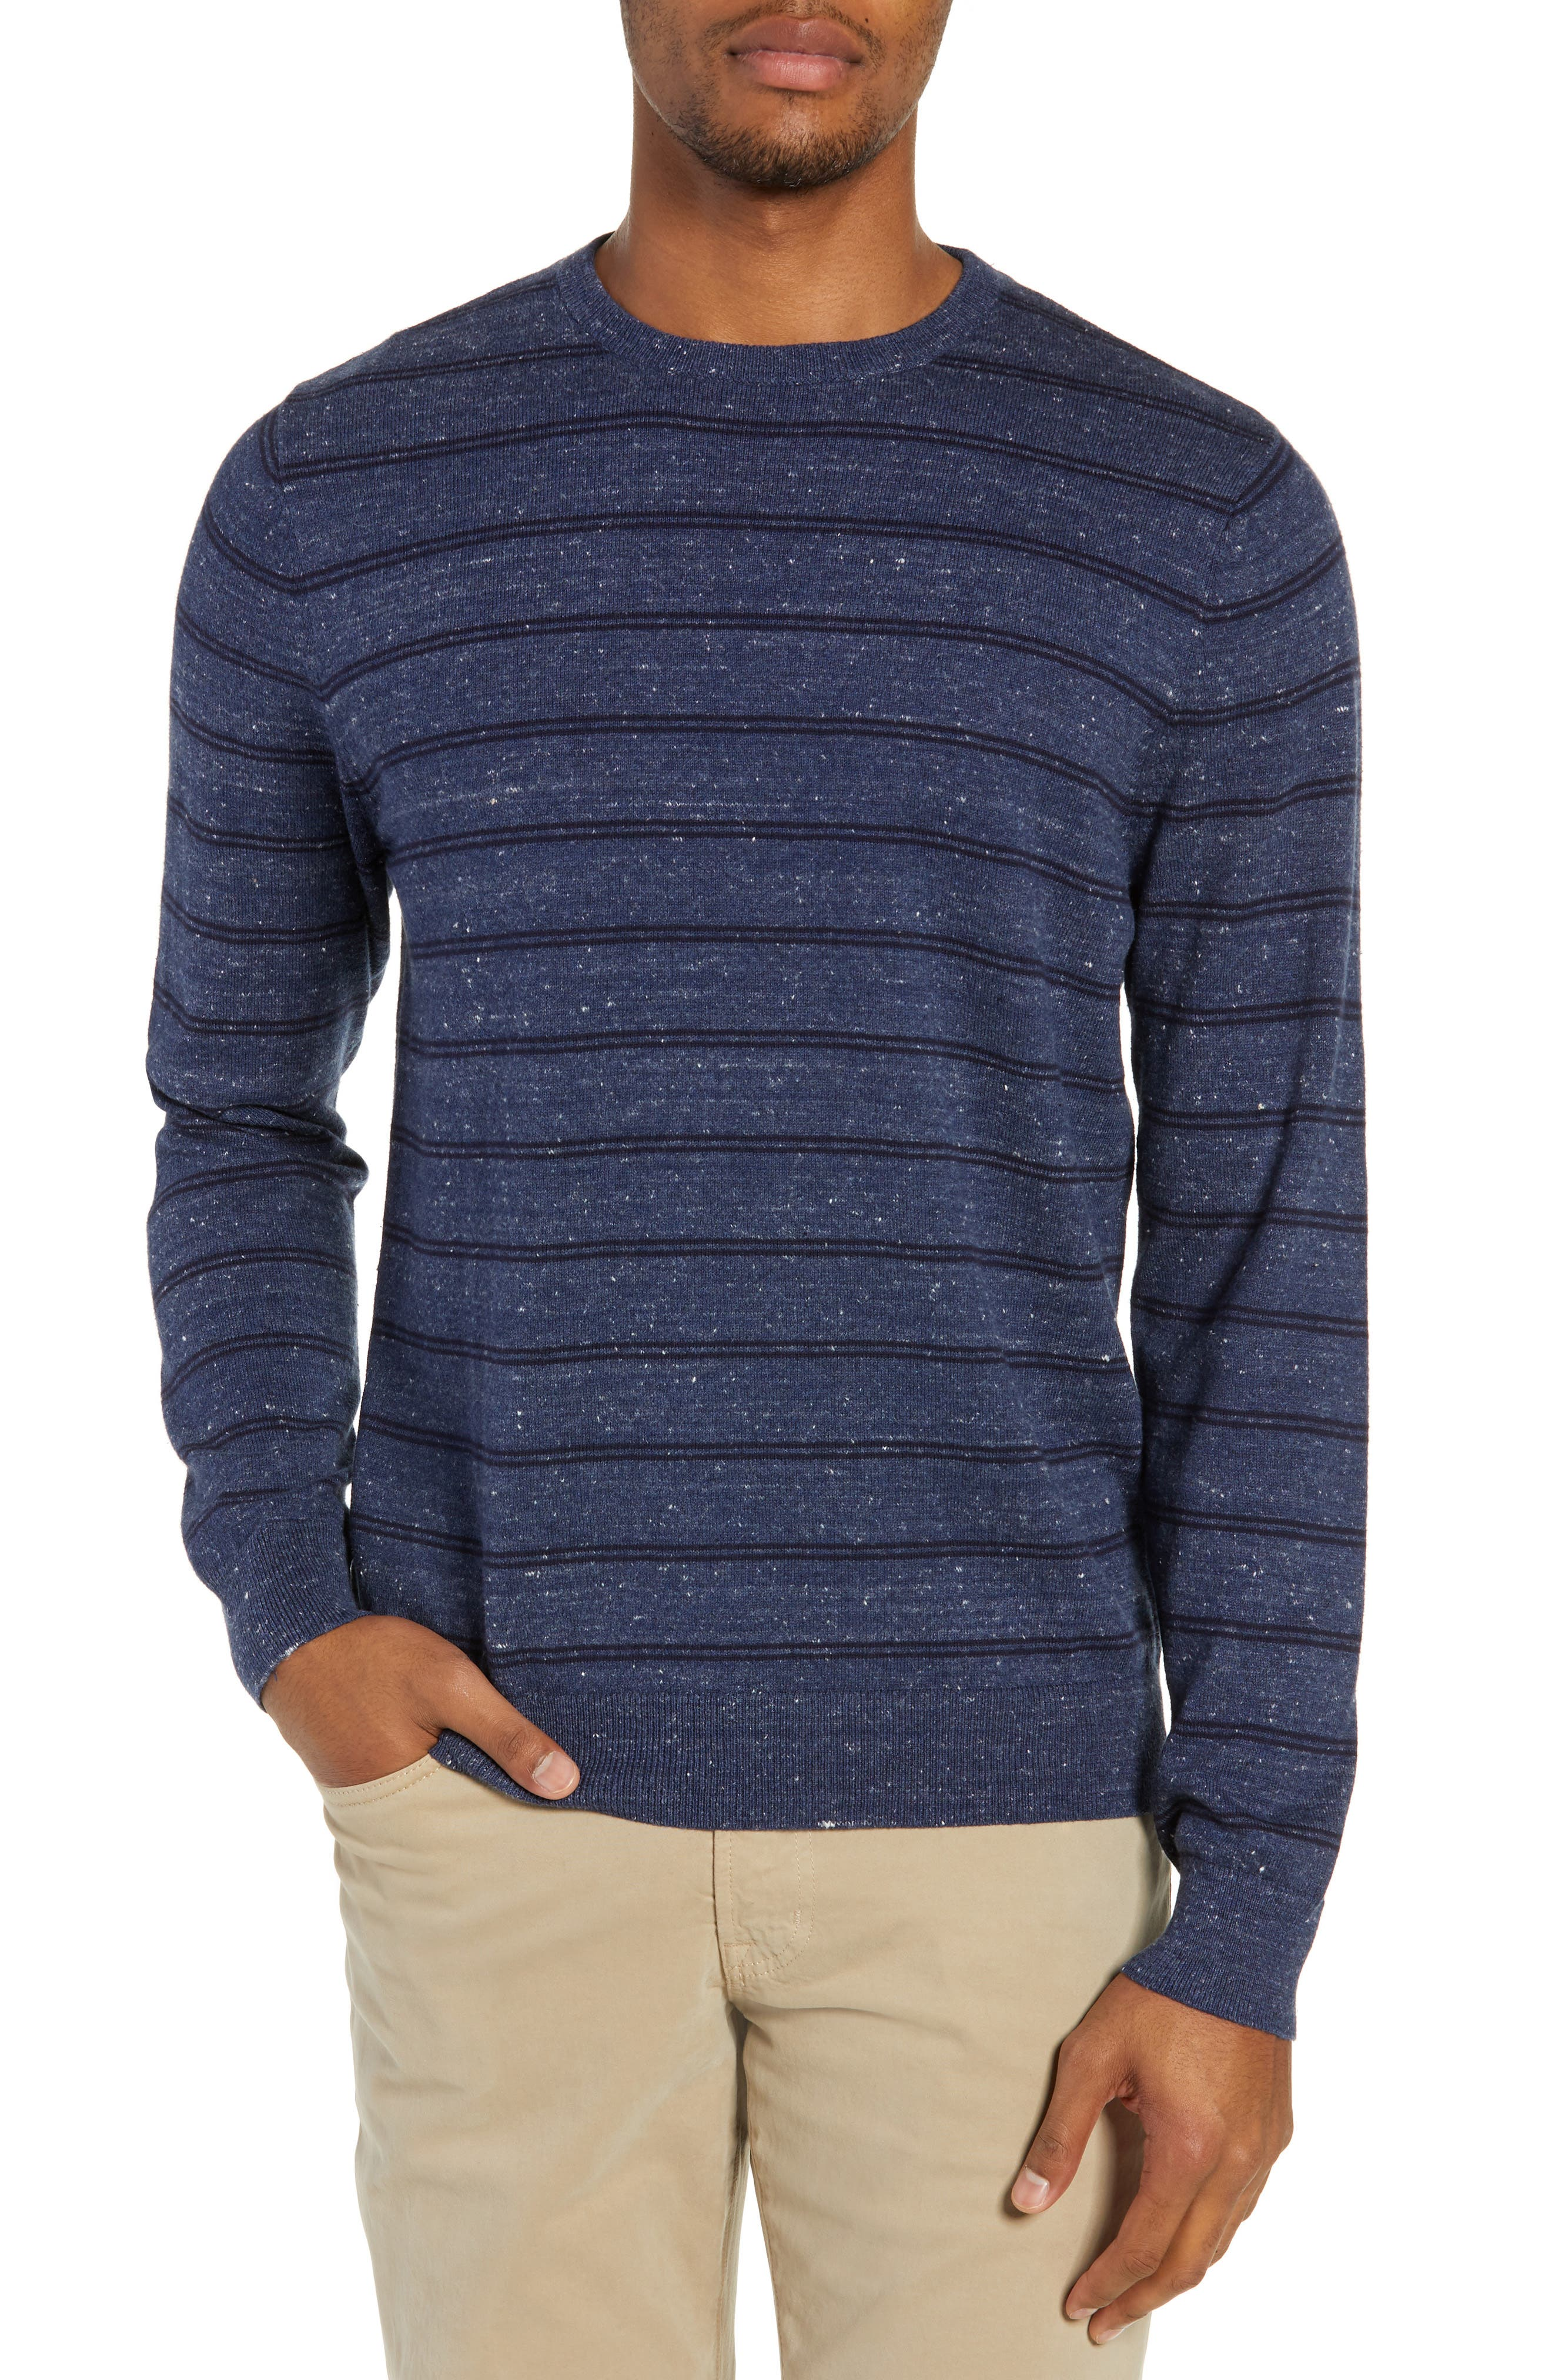 Nordstrom Shop Regular Fit Stripe Cotton & Cashmere Sweater, Blue